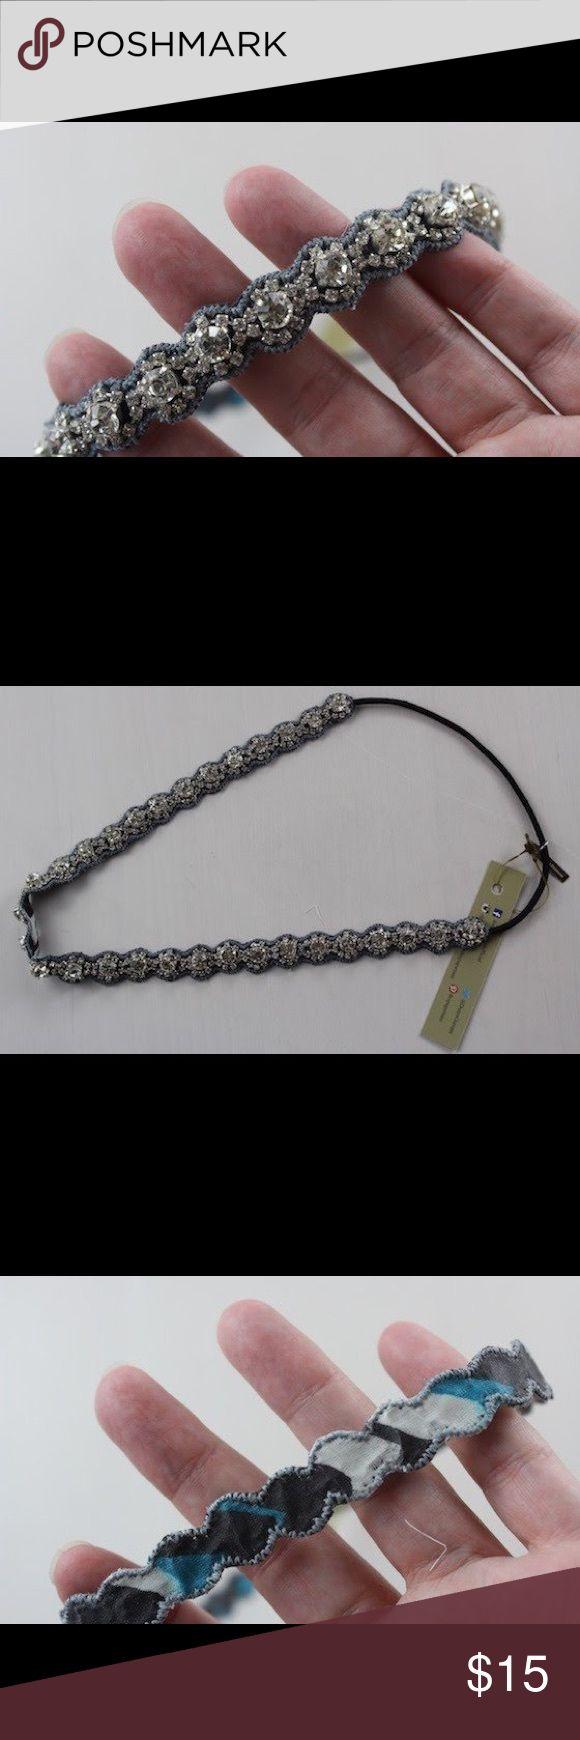 Deepa Gurnani Katie Crystal Headband New with tags removed. Never worn.  Price firm unless bundled, thank you. deepa gurnani Accessories Hair Accessories